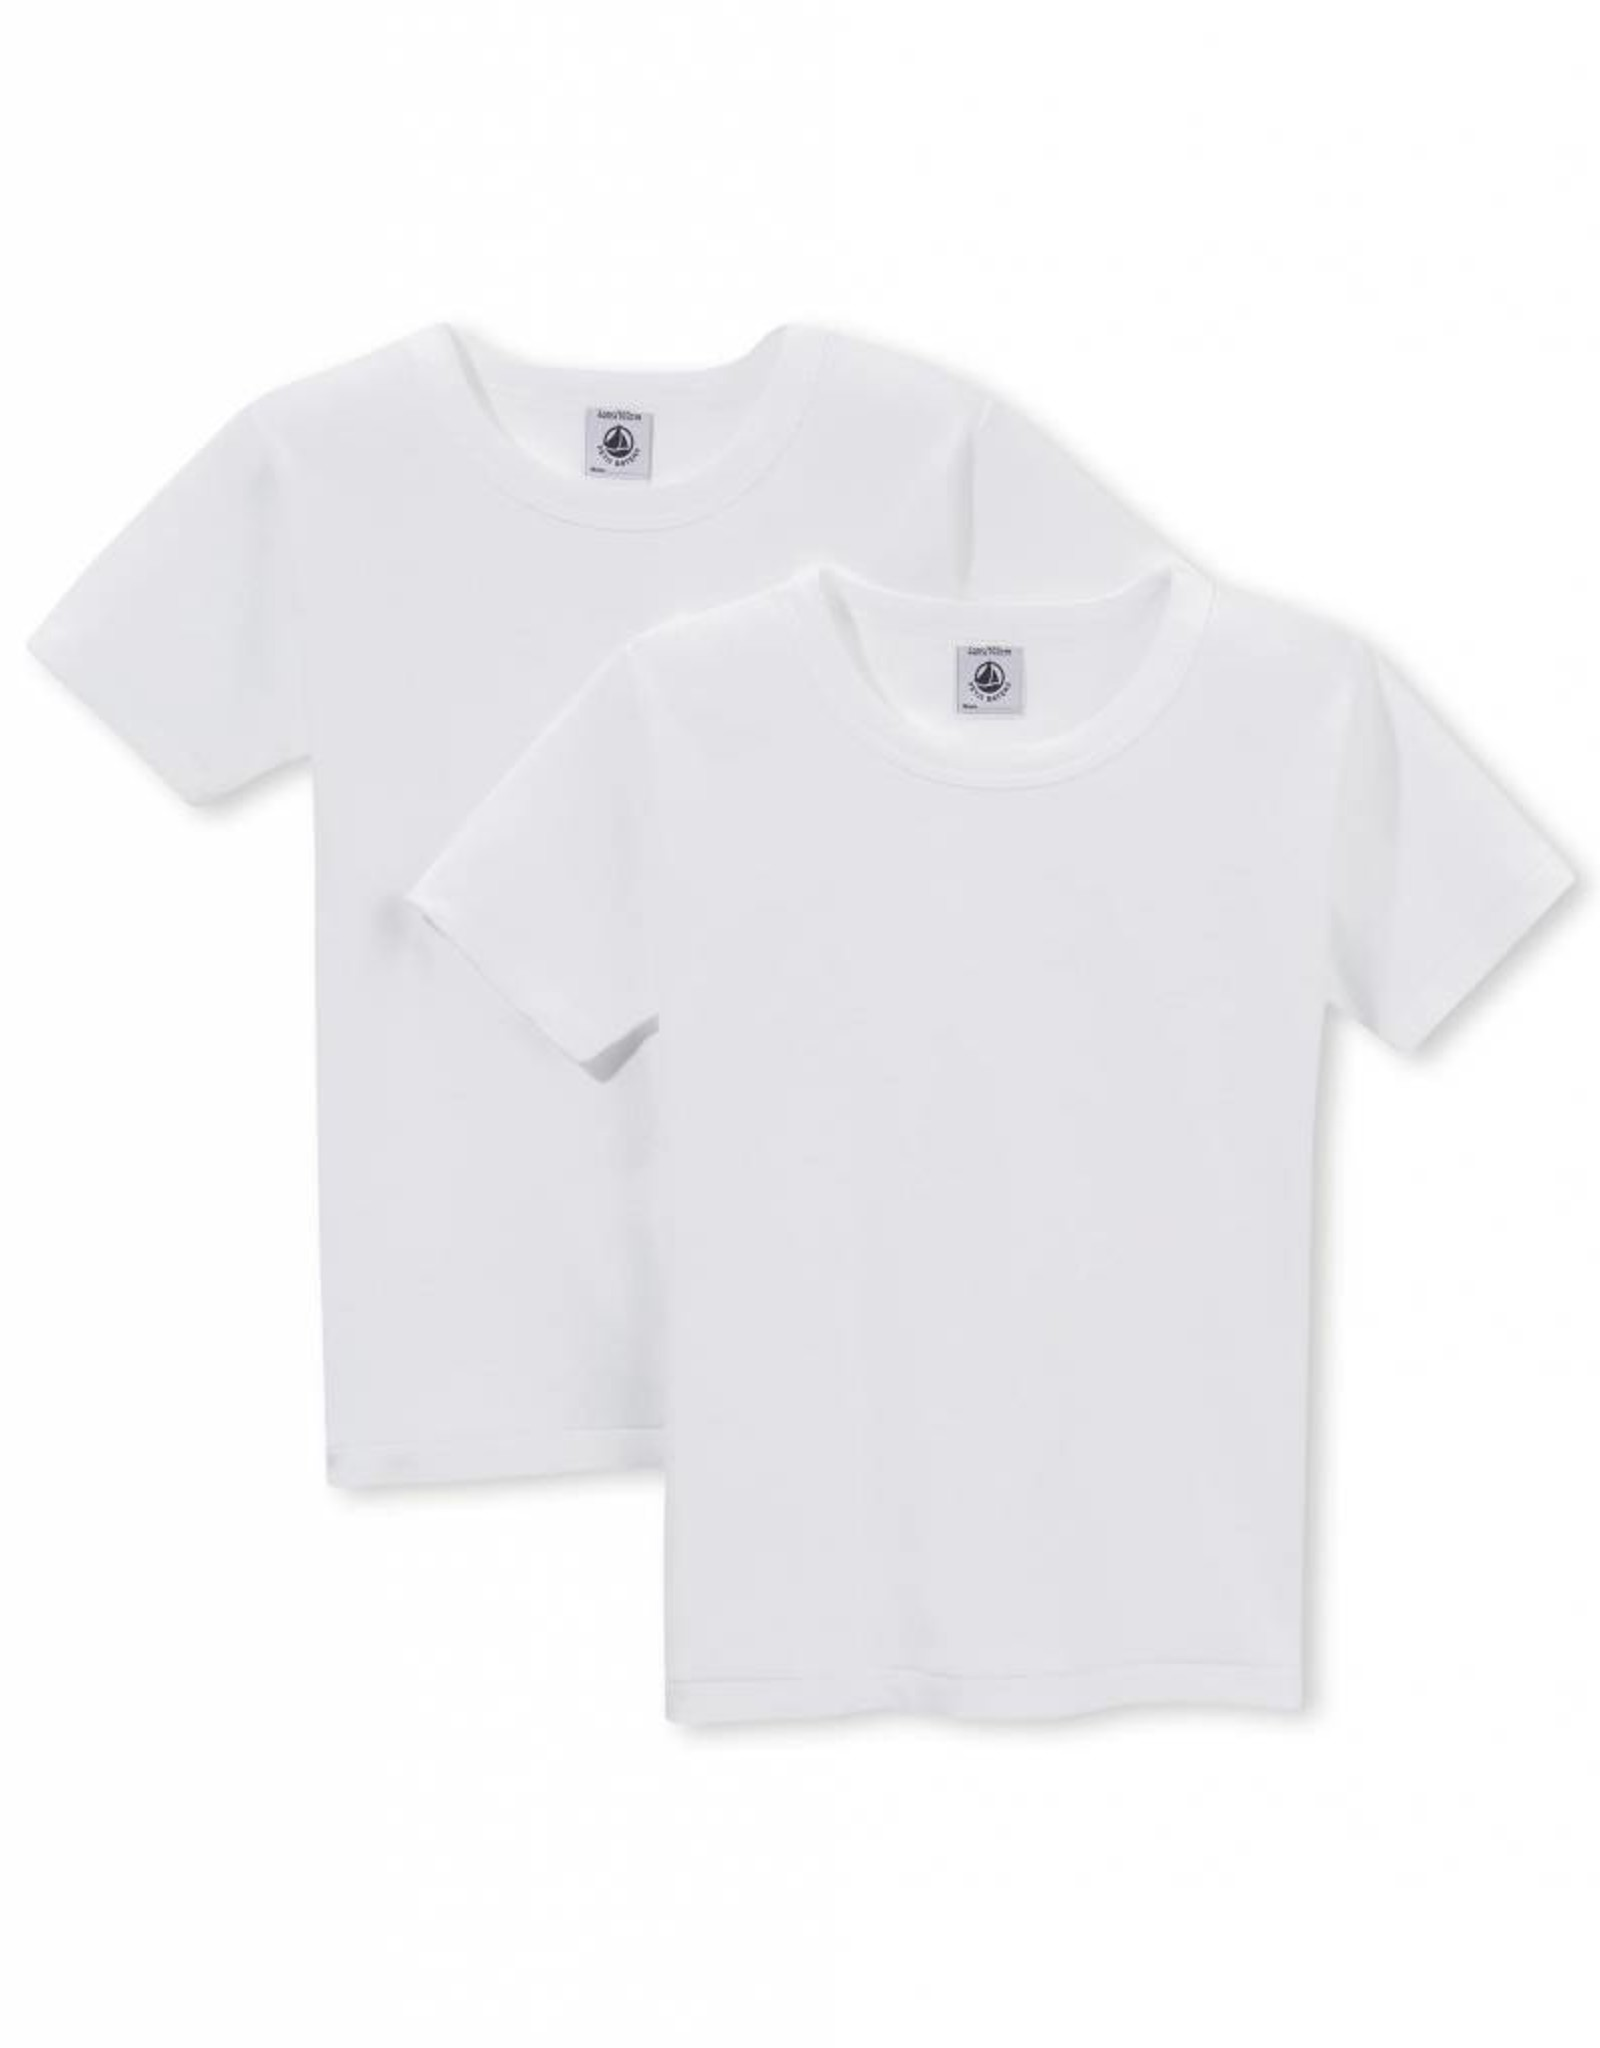 Set of 2 kids t-shirts